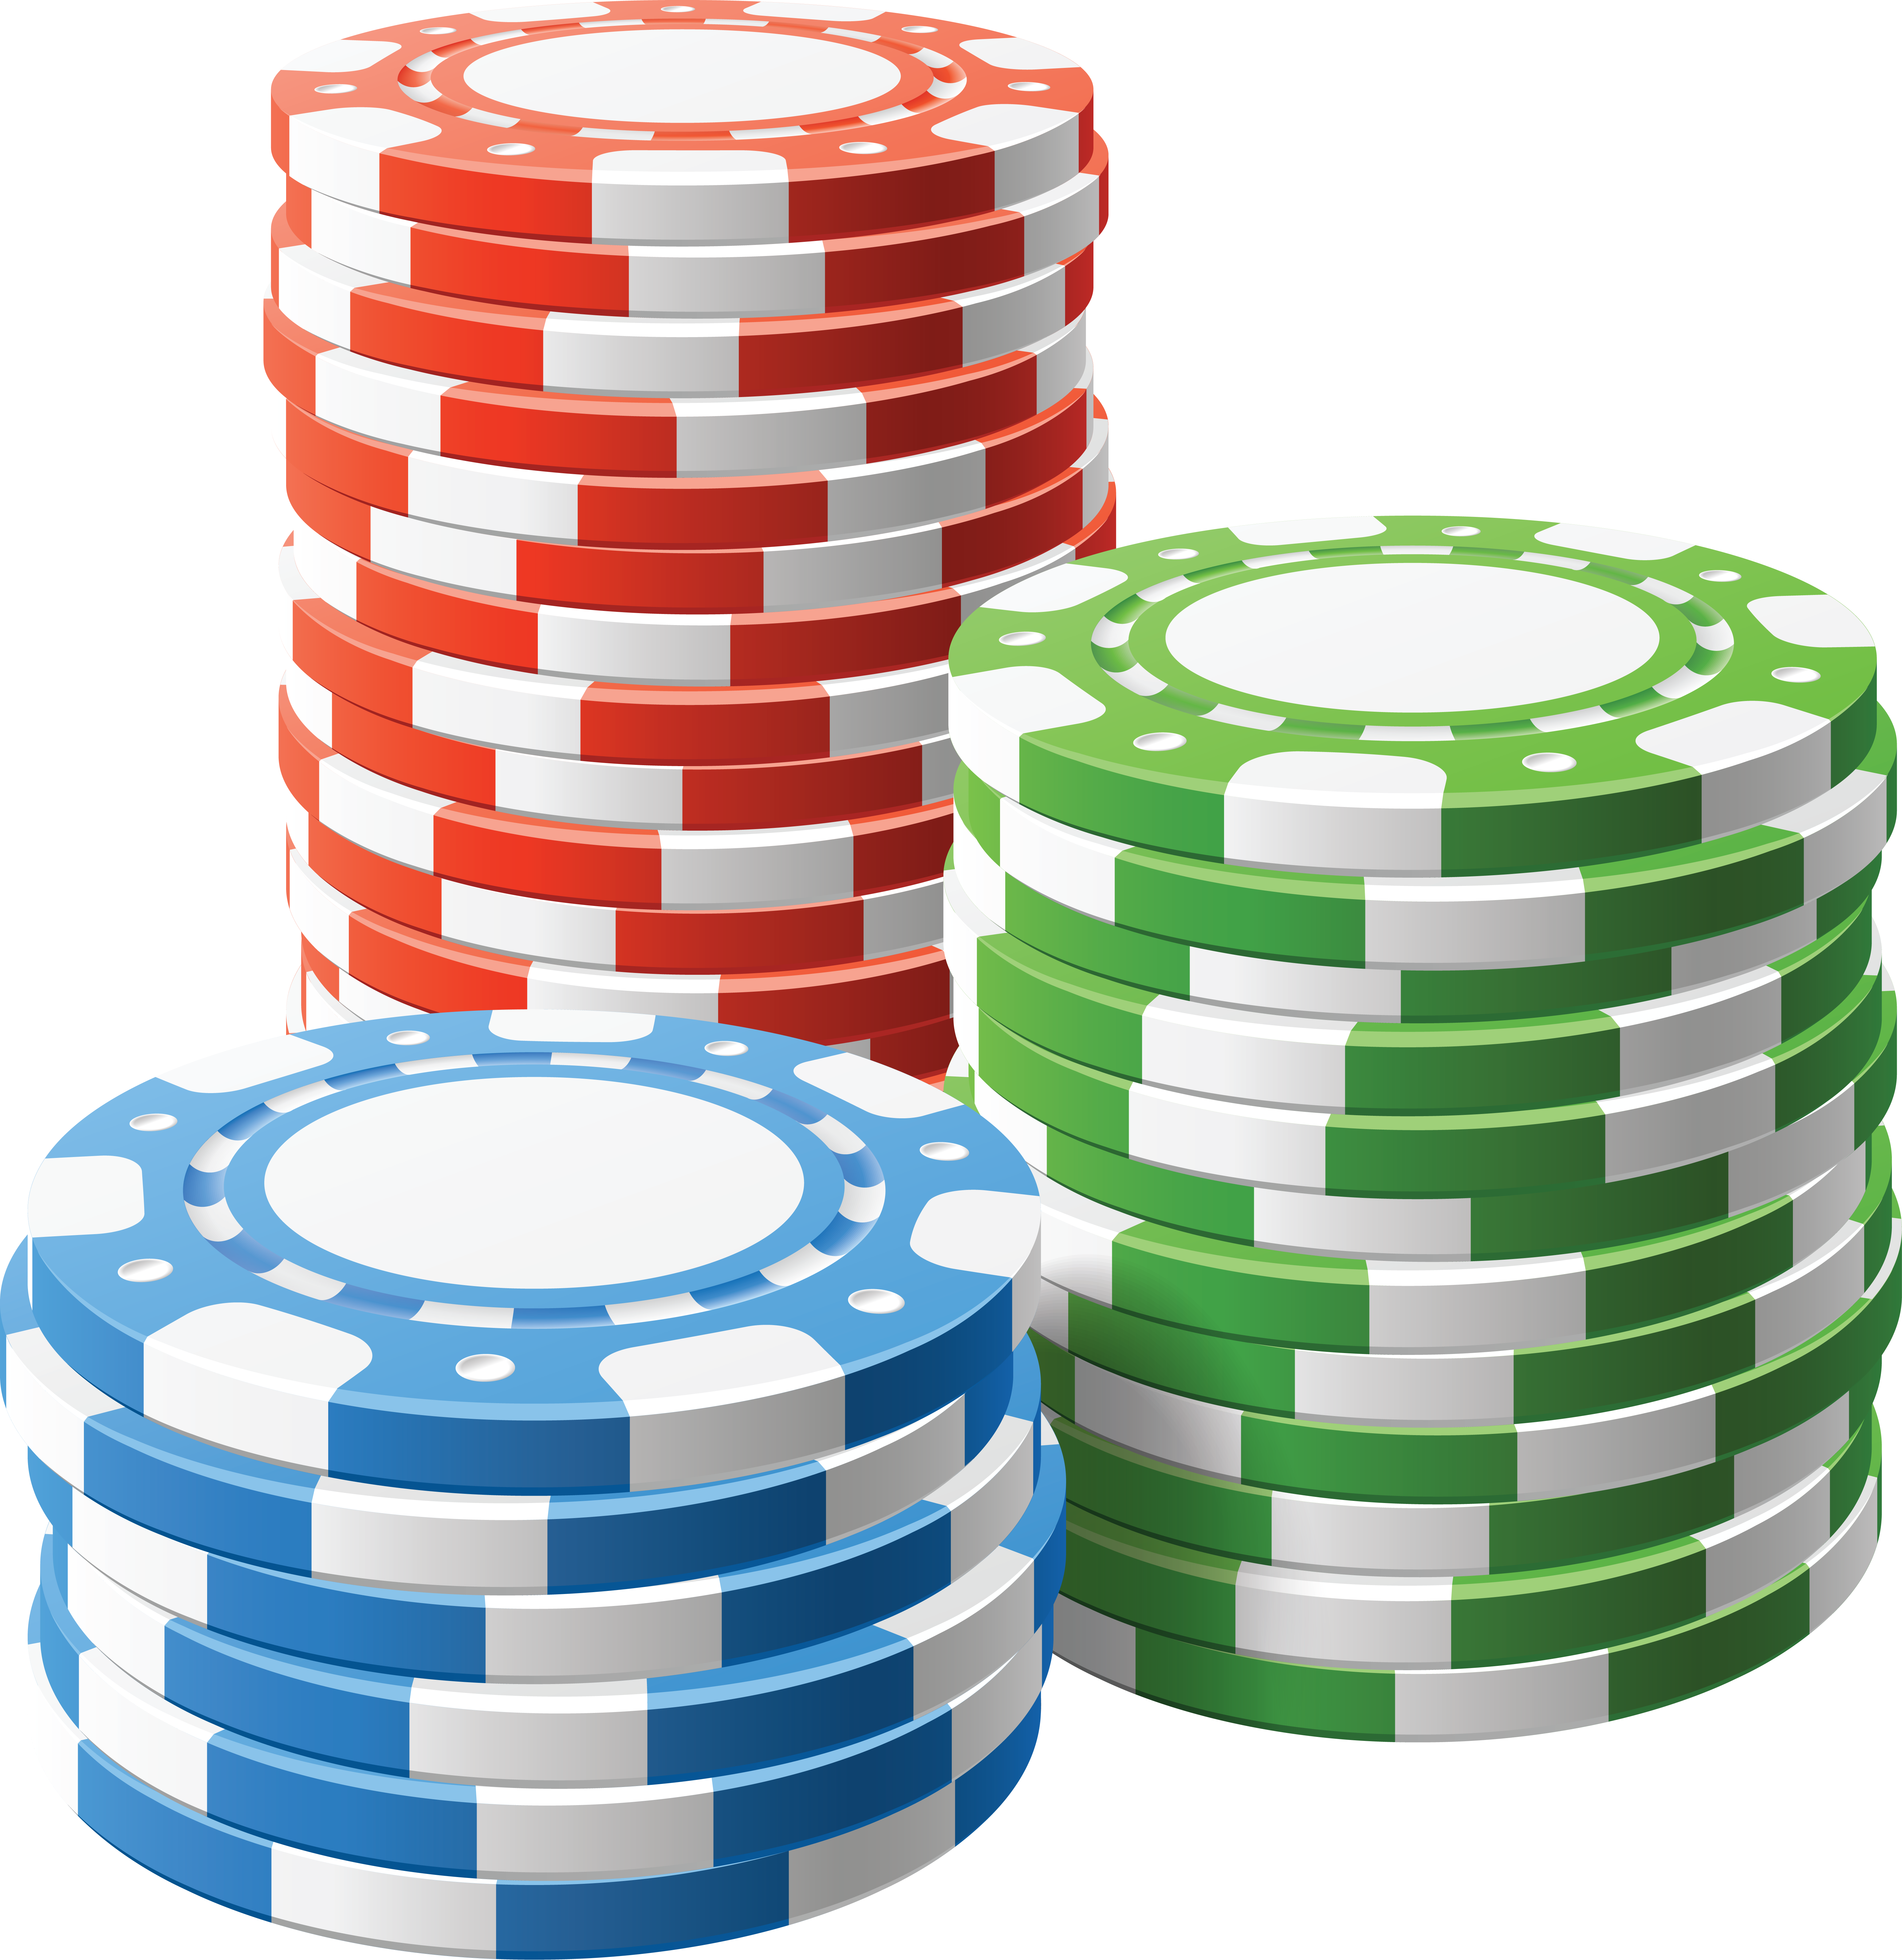 Chip casino clipart jpg transparent Pin by Printer on Clipart   Casino games, Poker chips, Poker jpg transparent